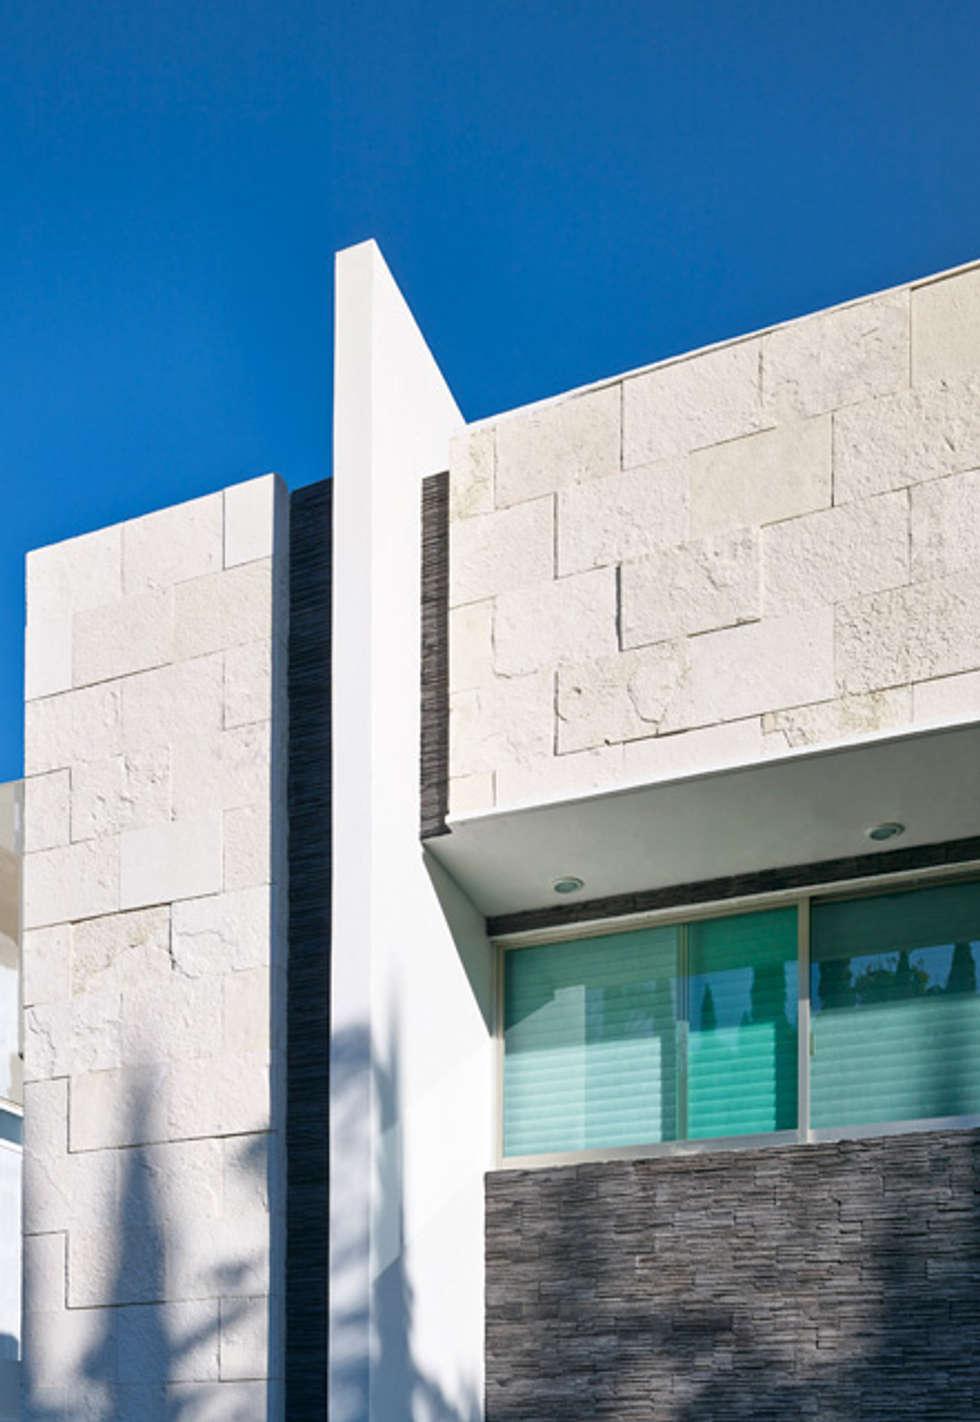 FACHADA DE PIEDRA: Casas de estilo moderno por Excelencia en Diseño